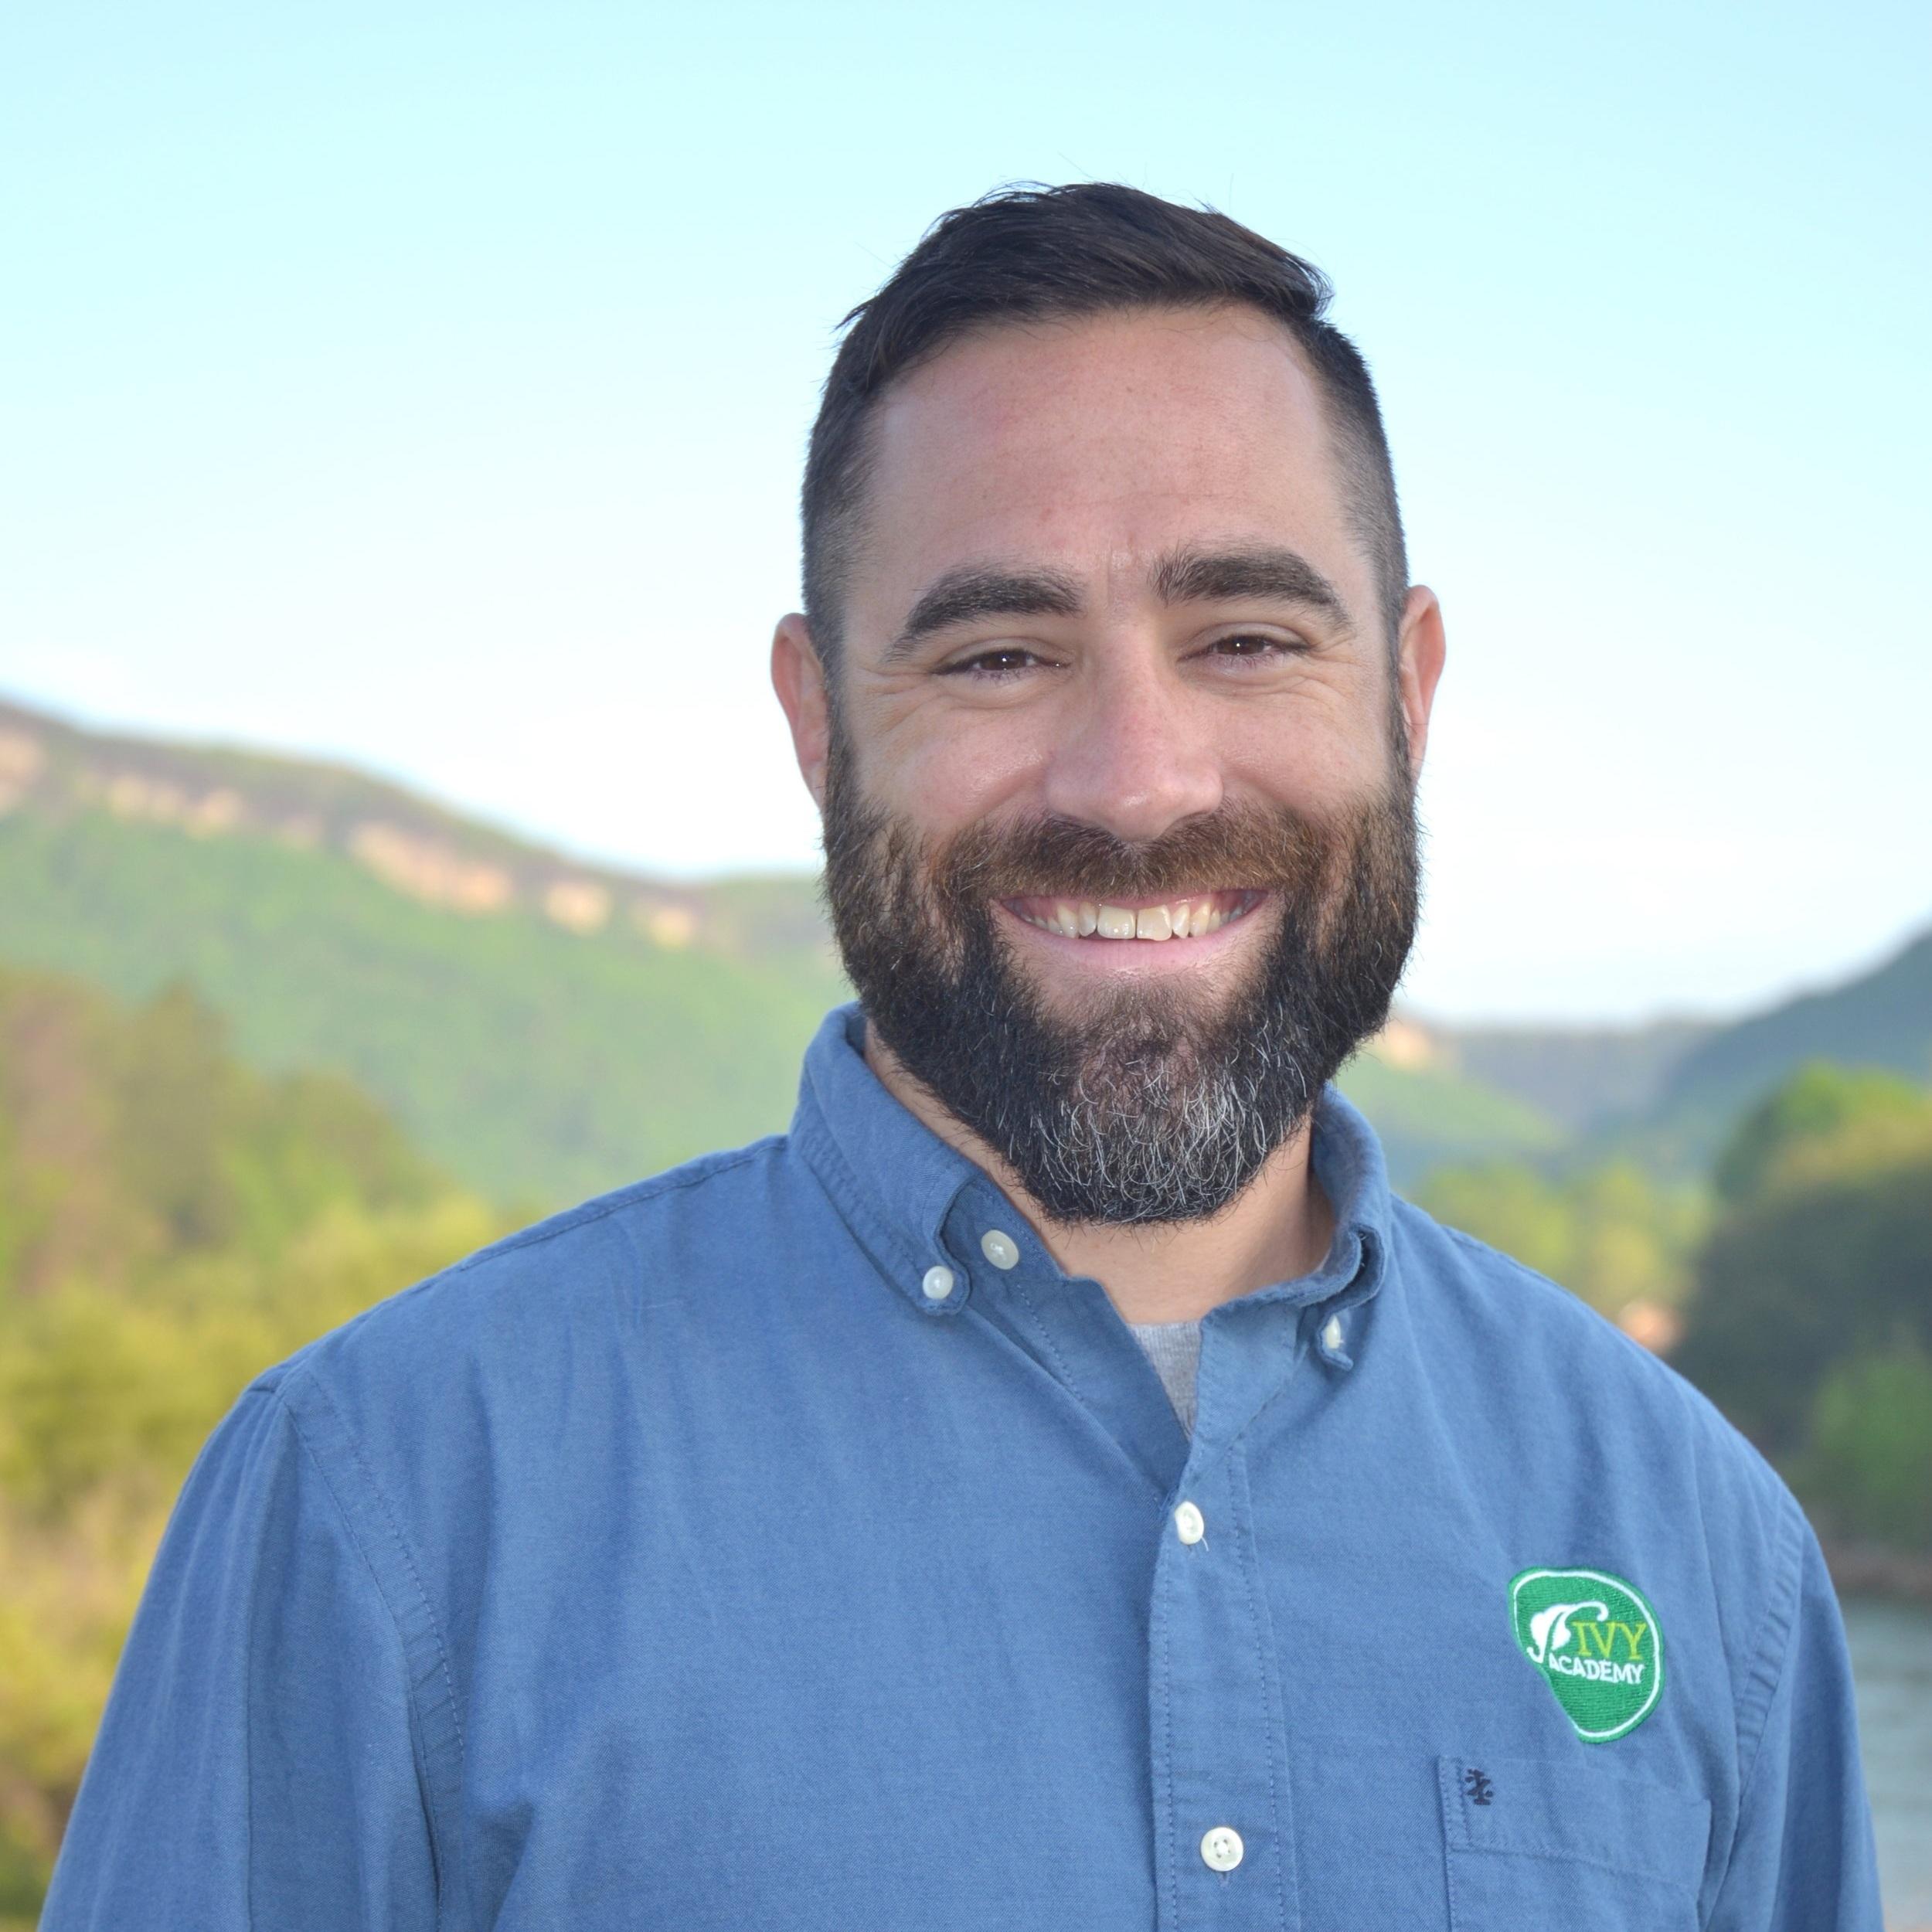 Adam Hudson  - Bible History Teacher and First Aid Specialist